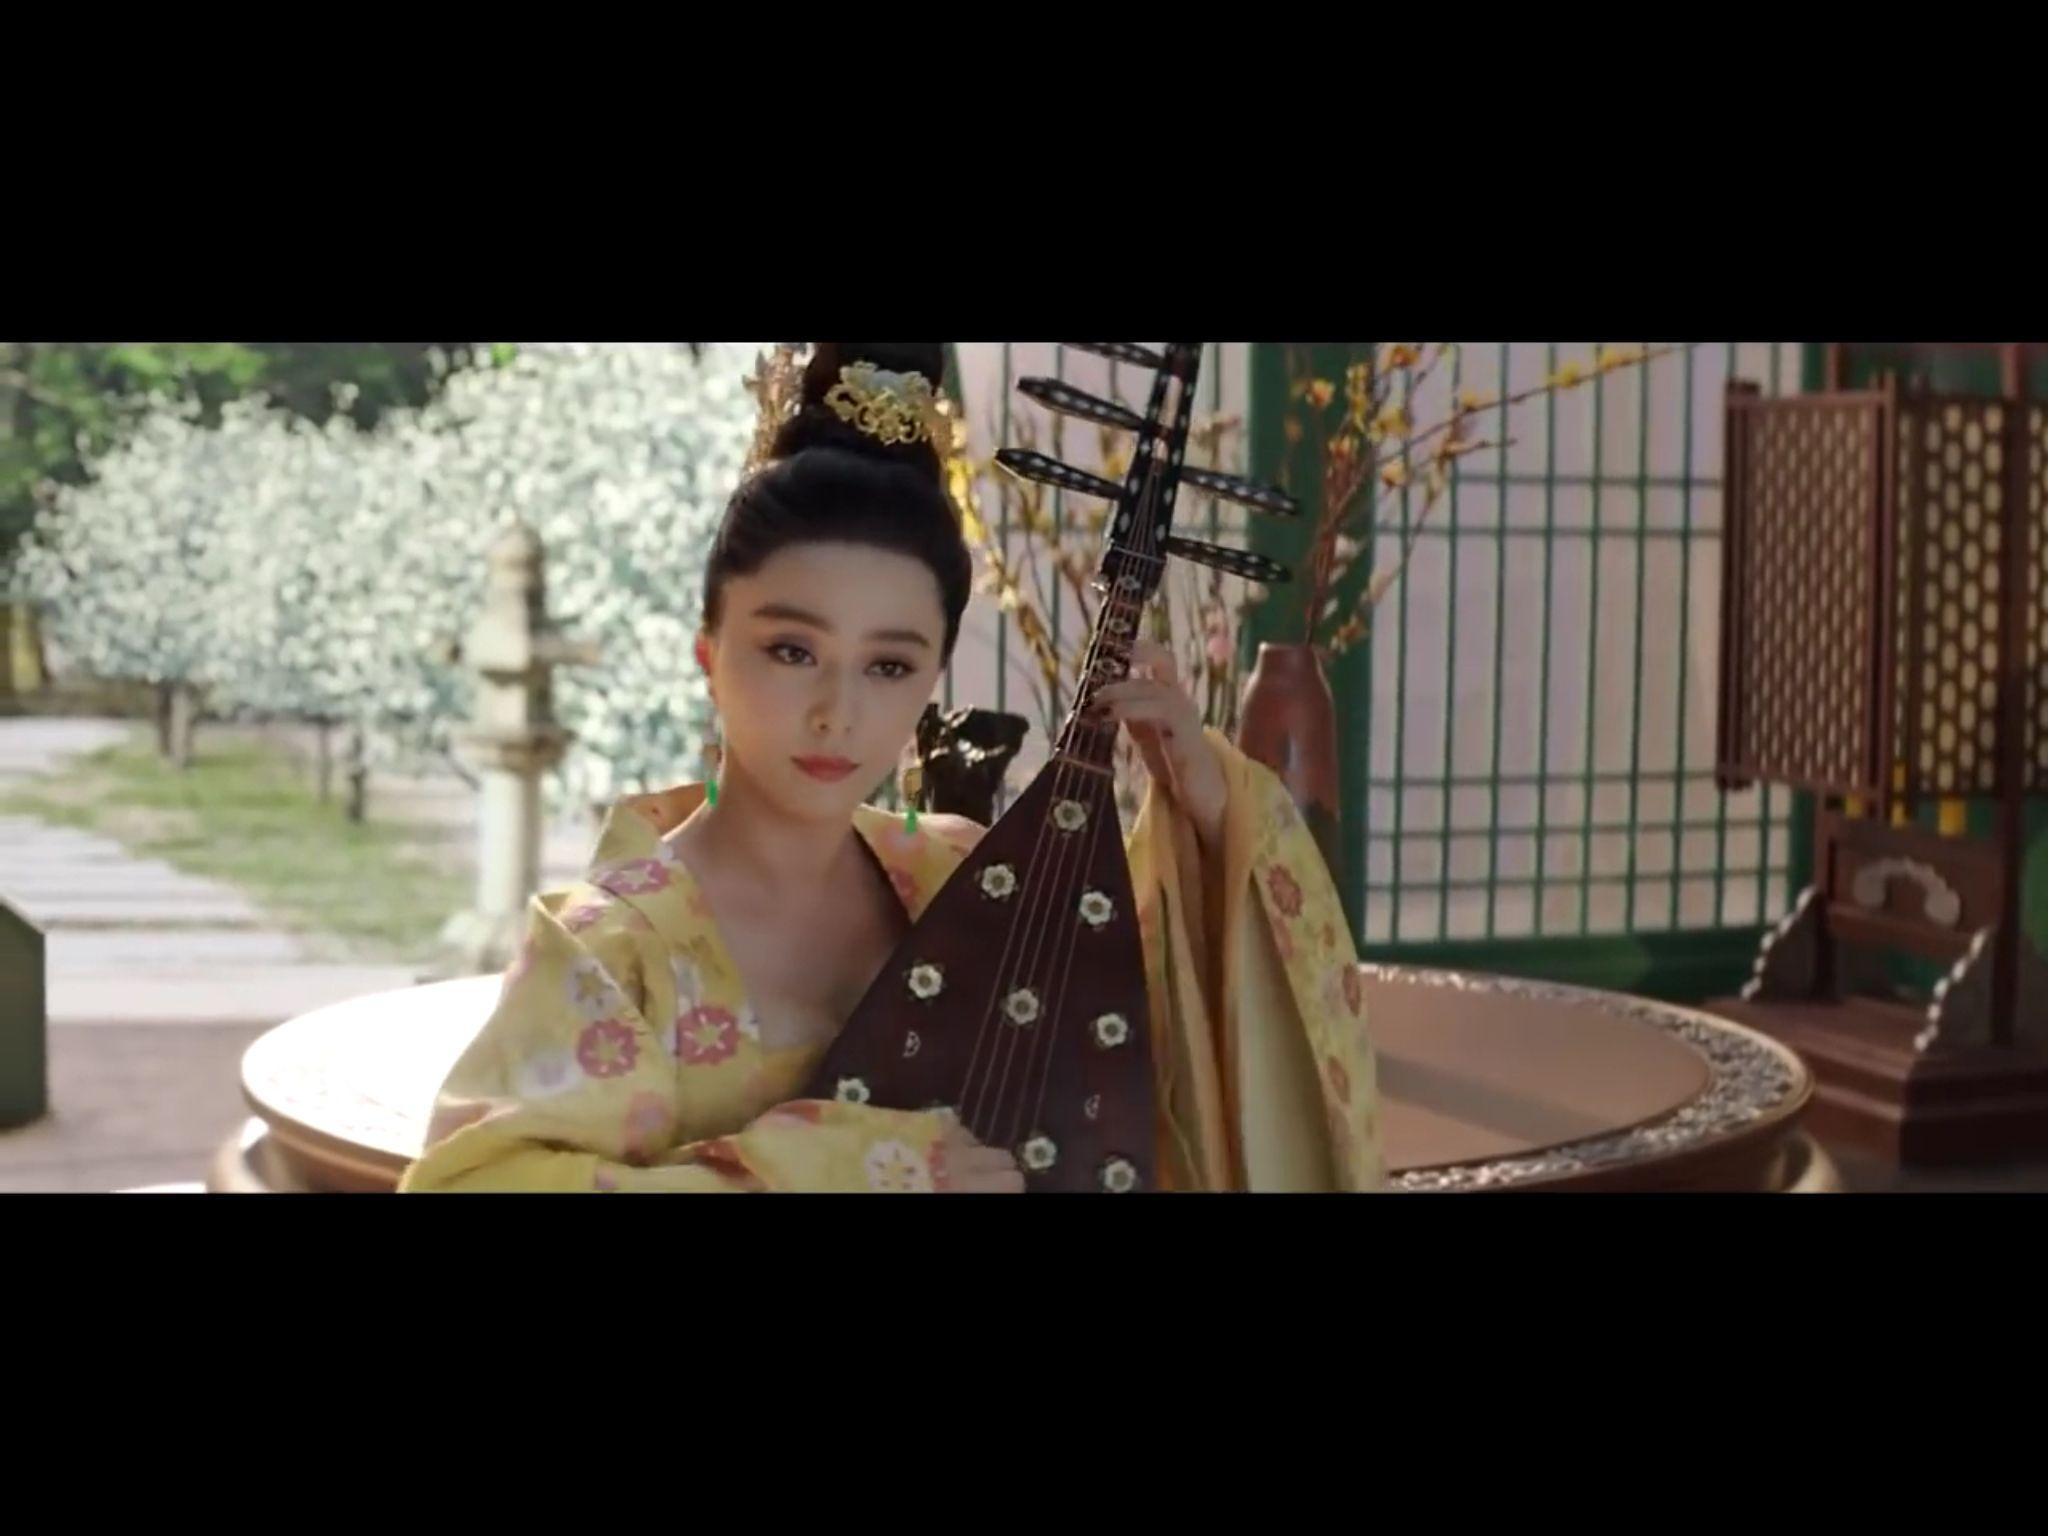 王朝的女人·杨贵妃 剧照 / The Lady of the Dynasty Chinese period